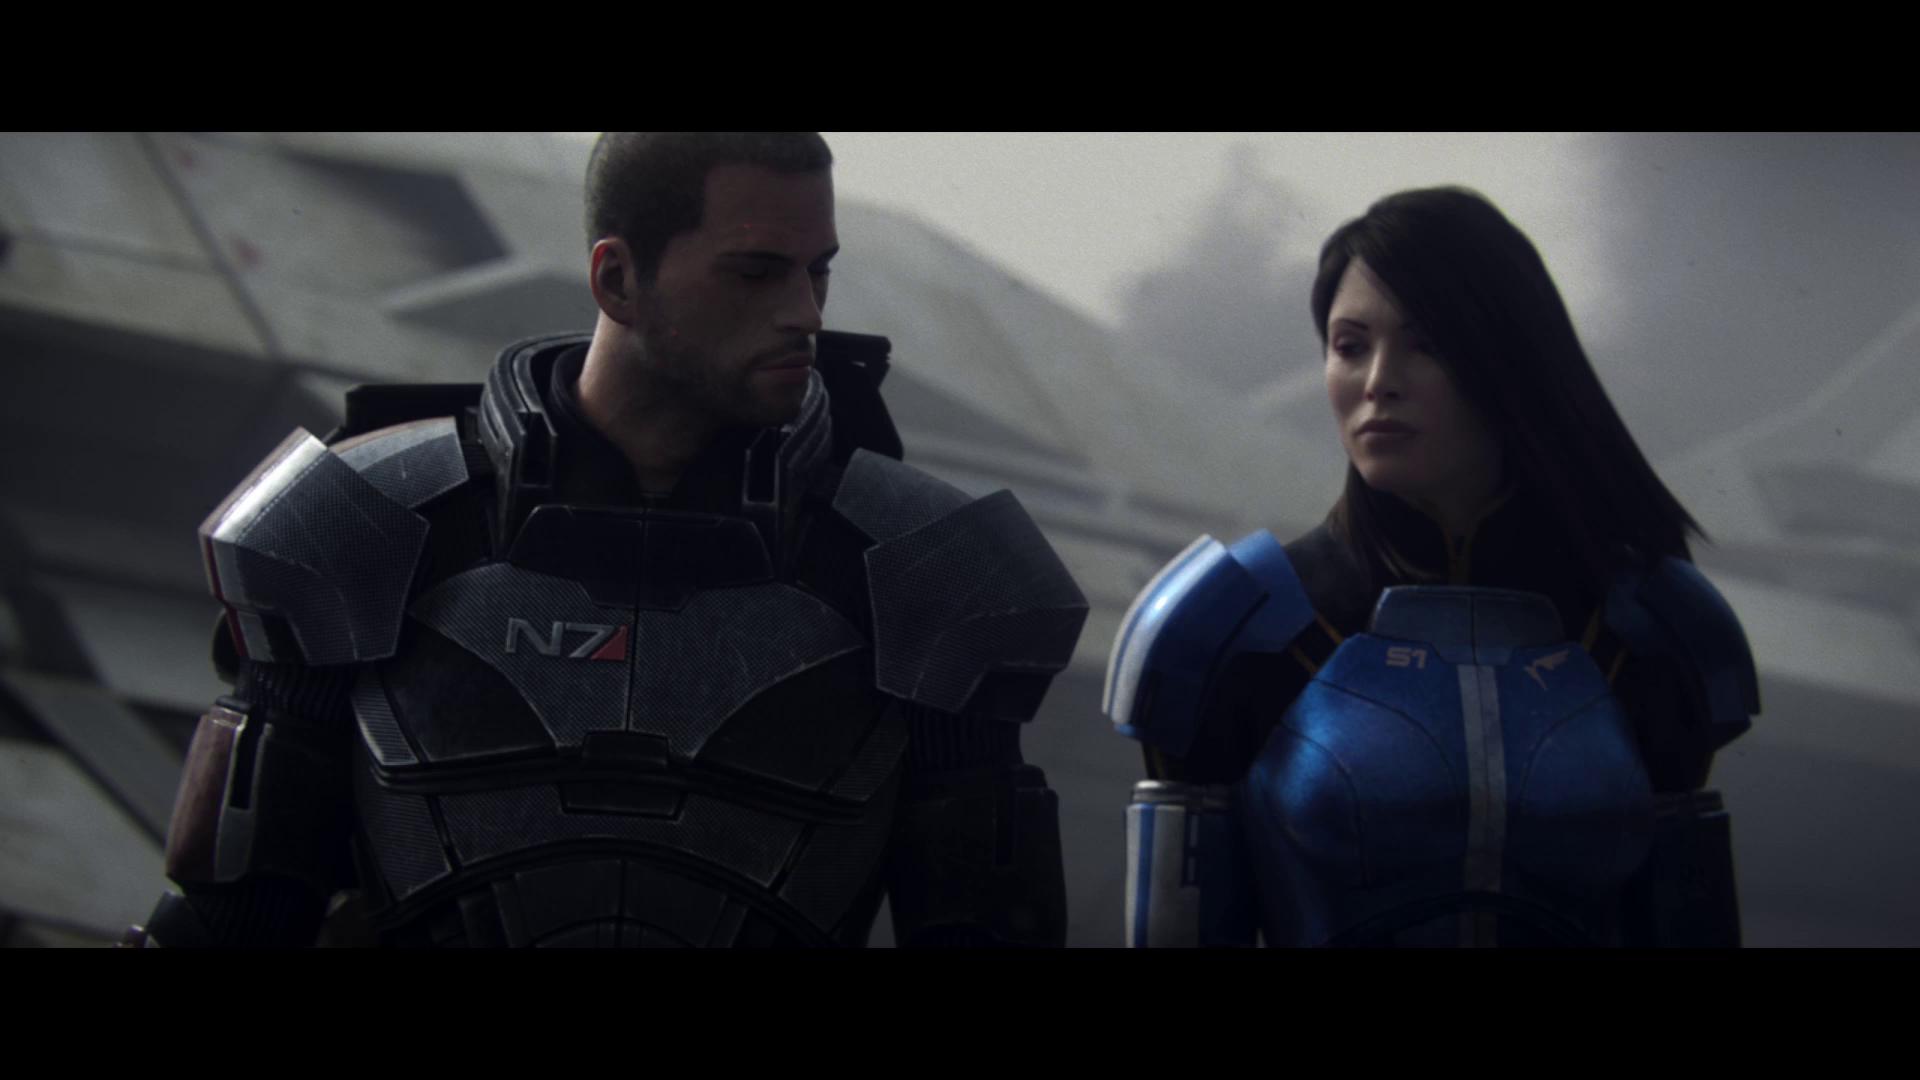 Mass Effect 3 'Take Earth Back' Trailer